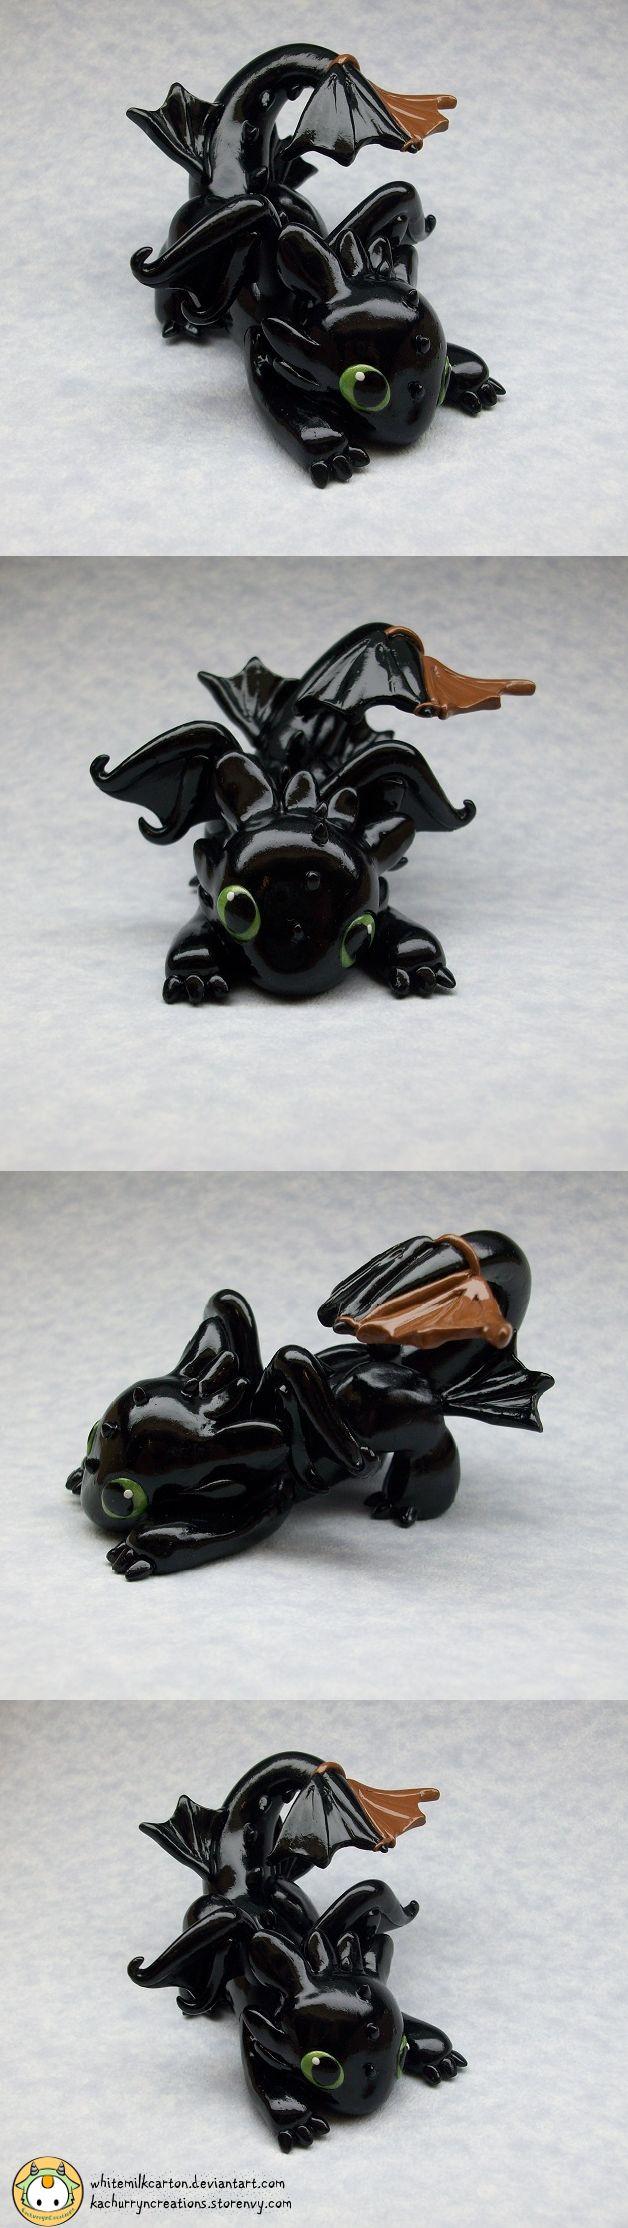 Toothless (Commission) by whitemilkcarton.deviantart.com on @deviantART